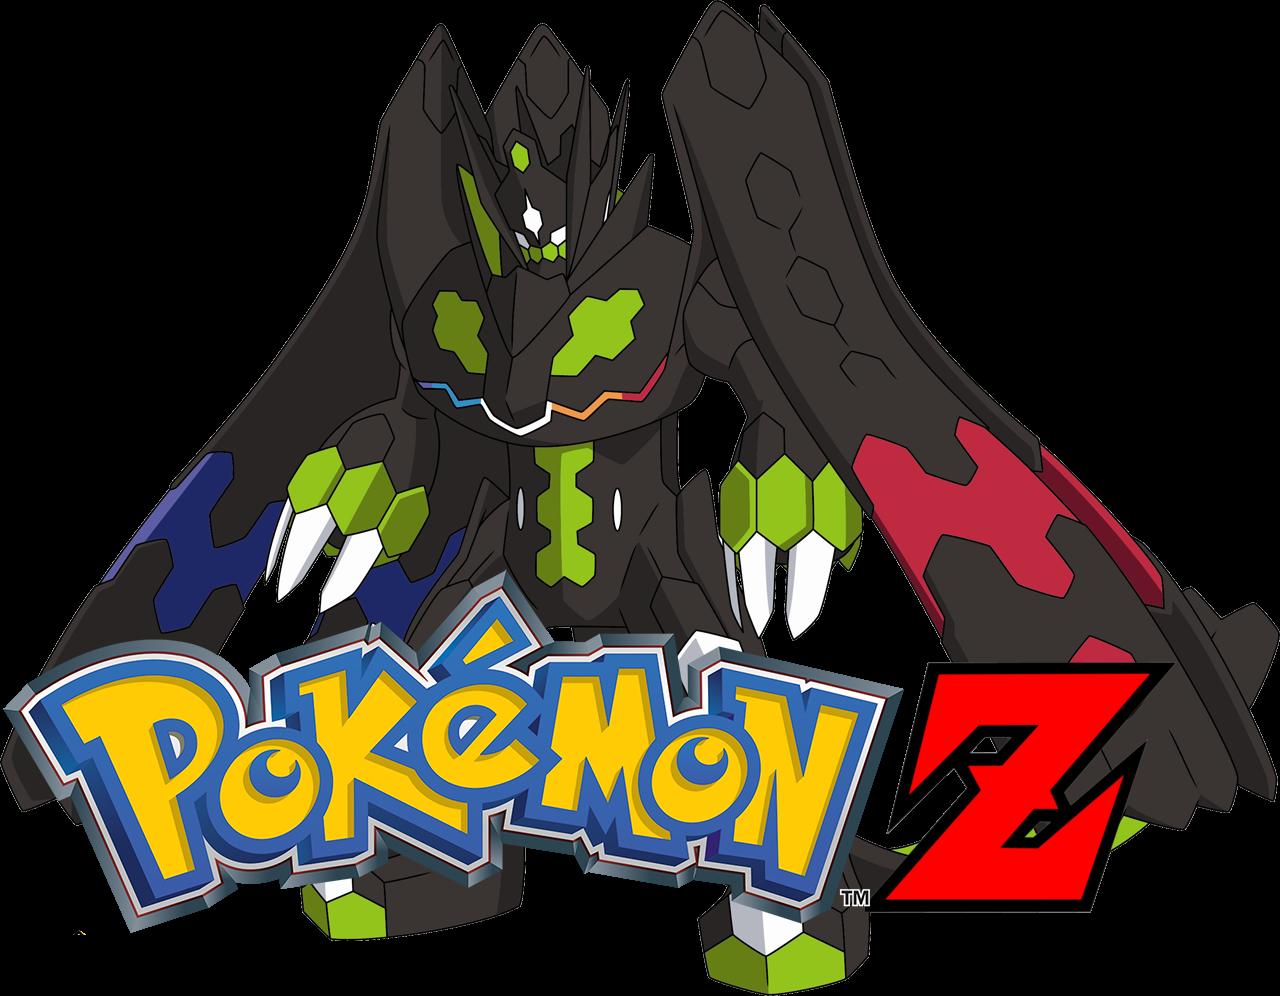 Z confirmed kappa pok. Youtube clipart pokemon